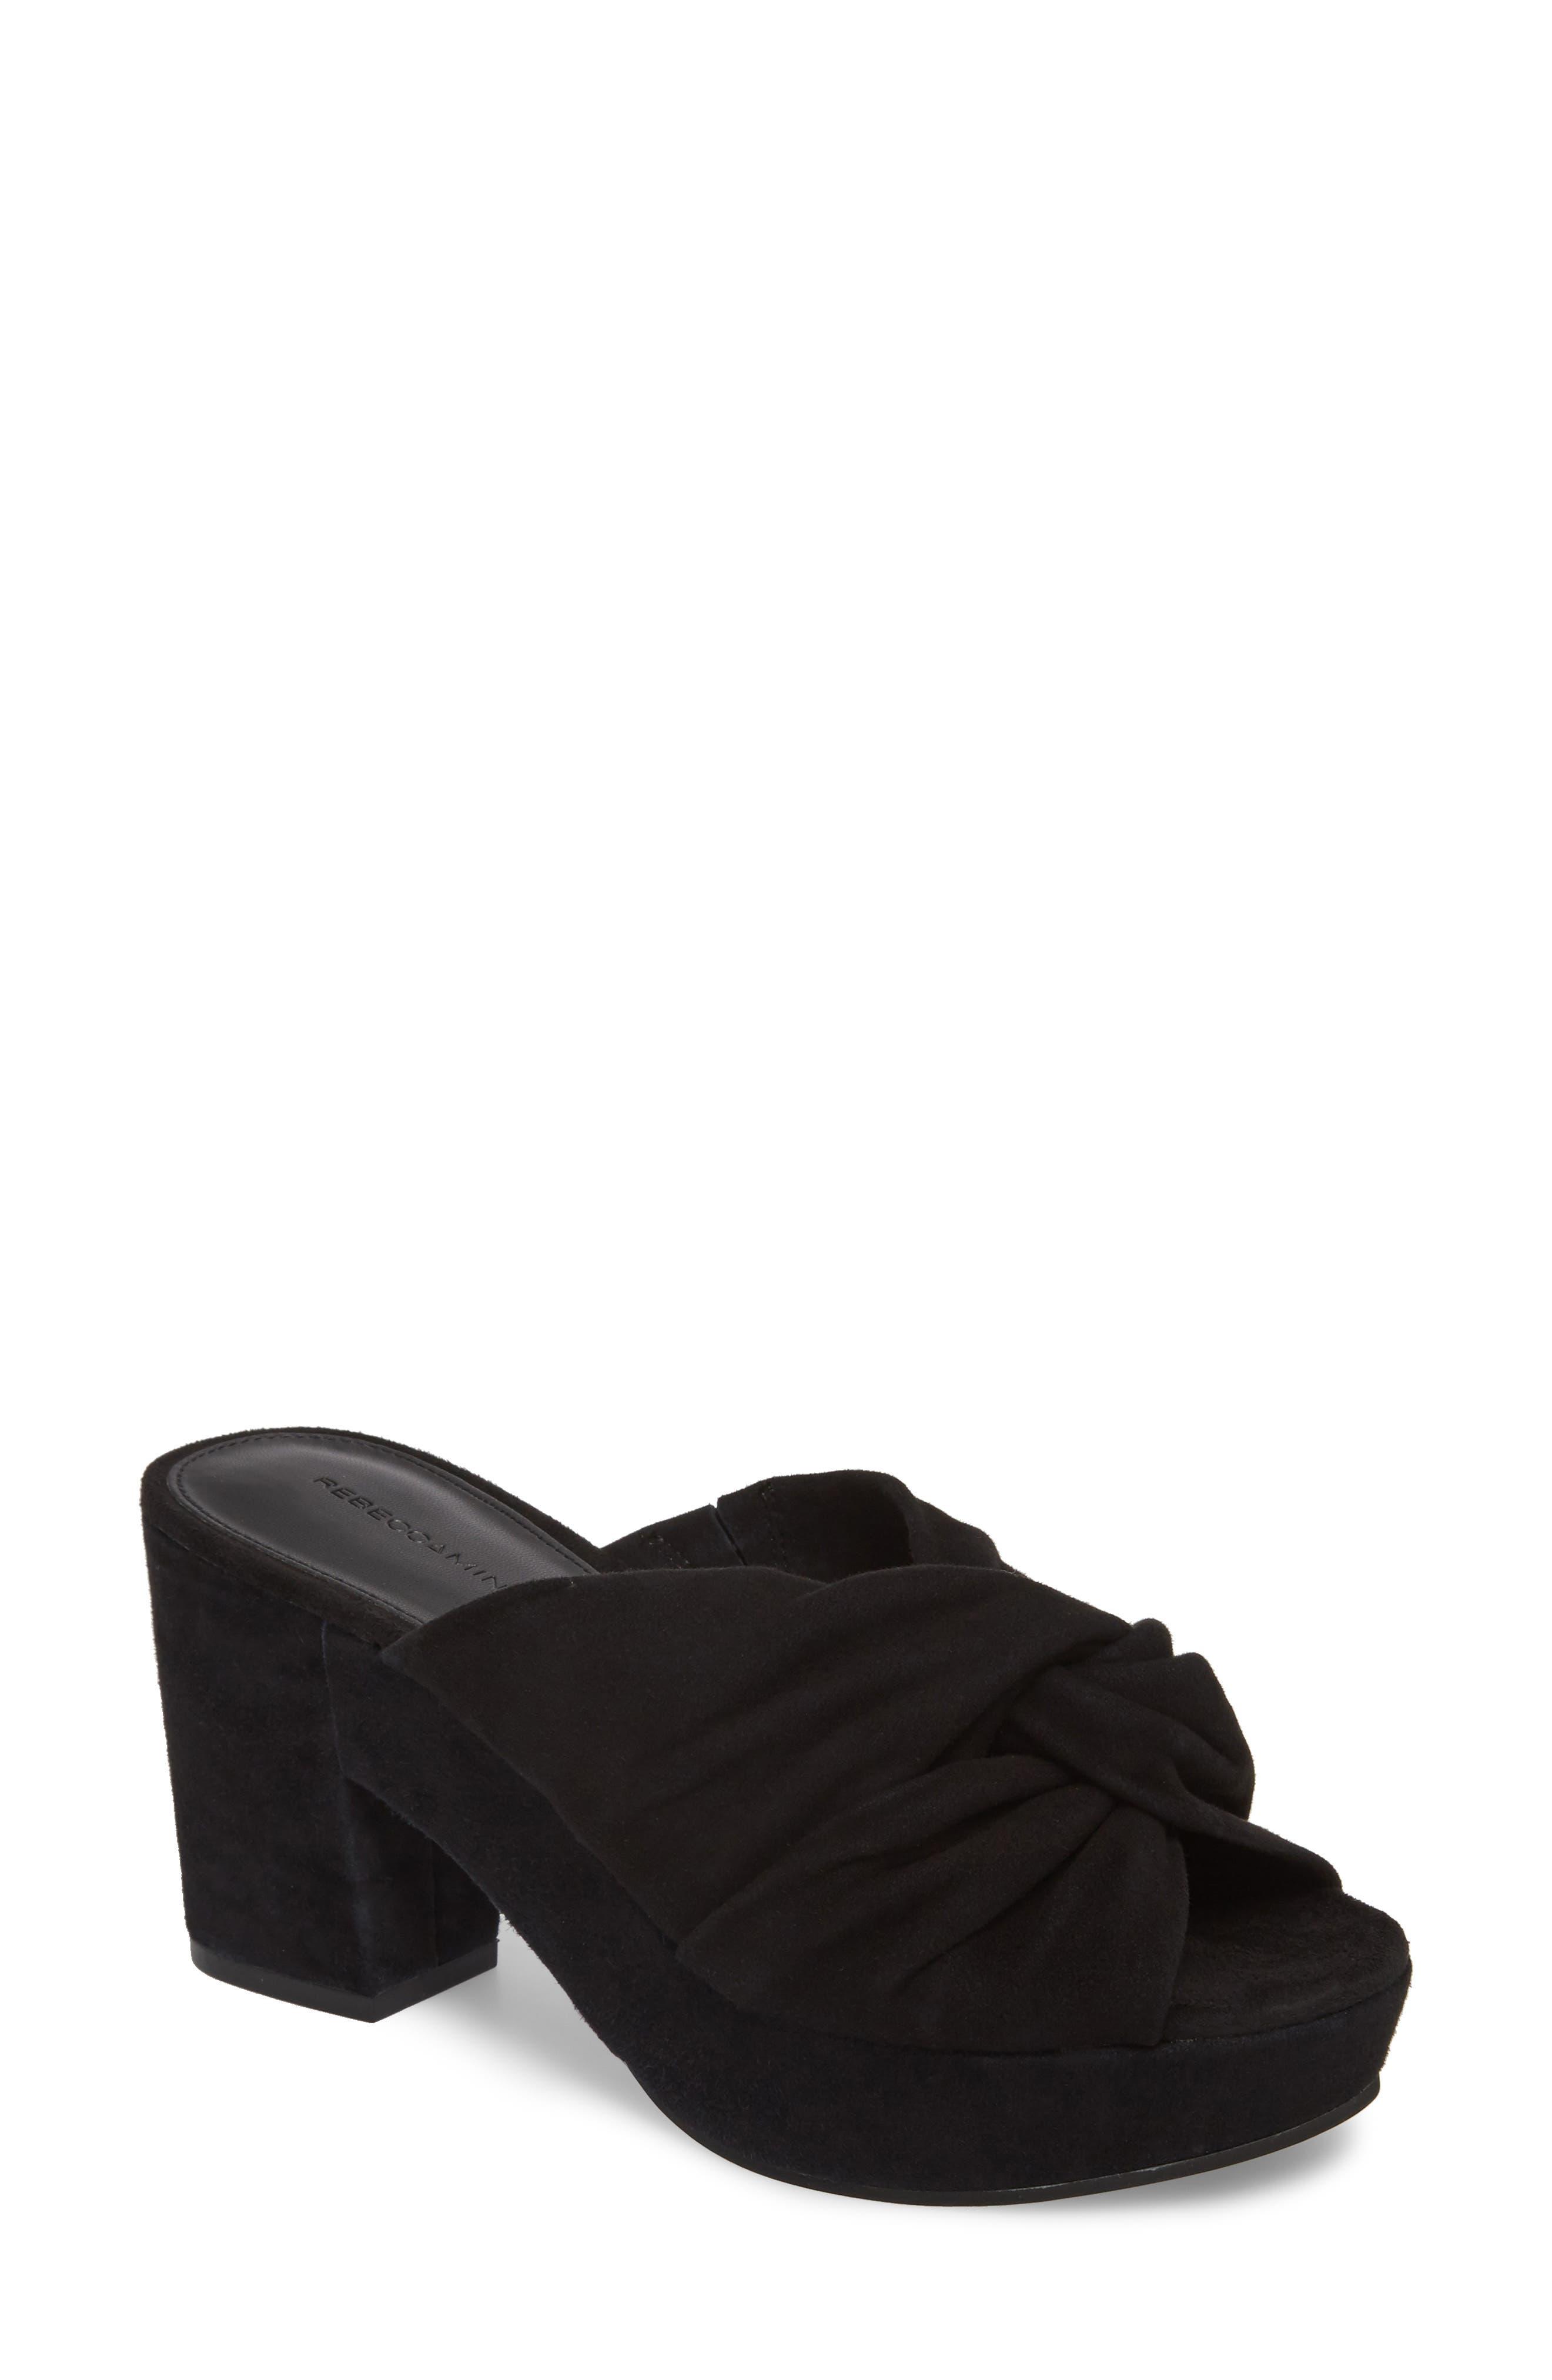 Jaden Slide Sandal,                             Main thumbnail 1, color,                             Black Satin